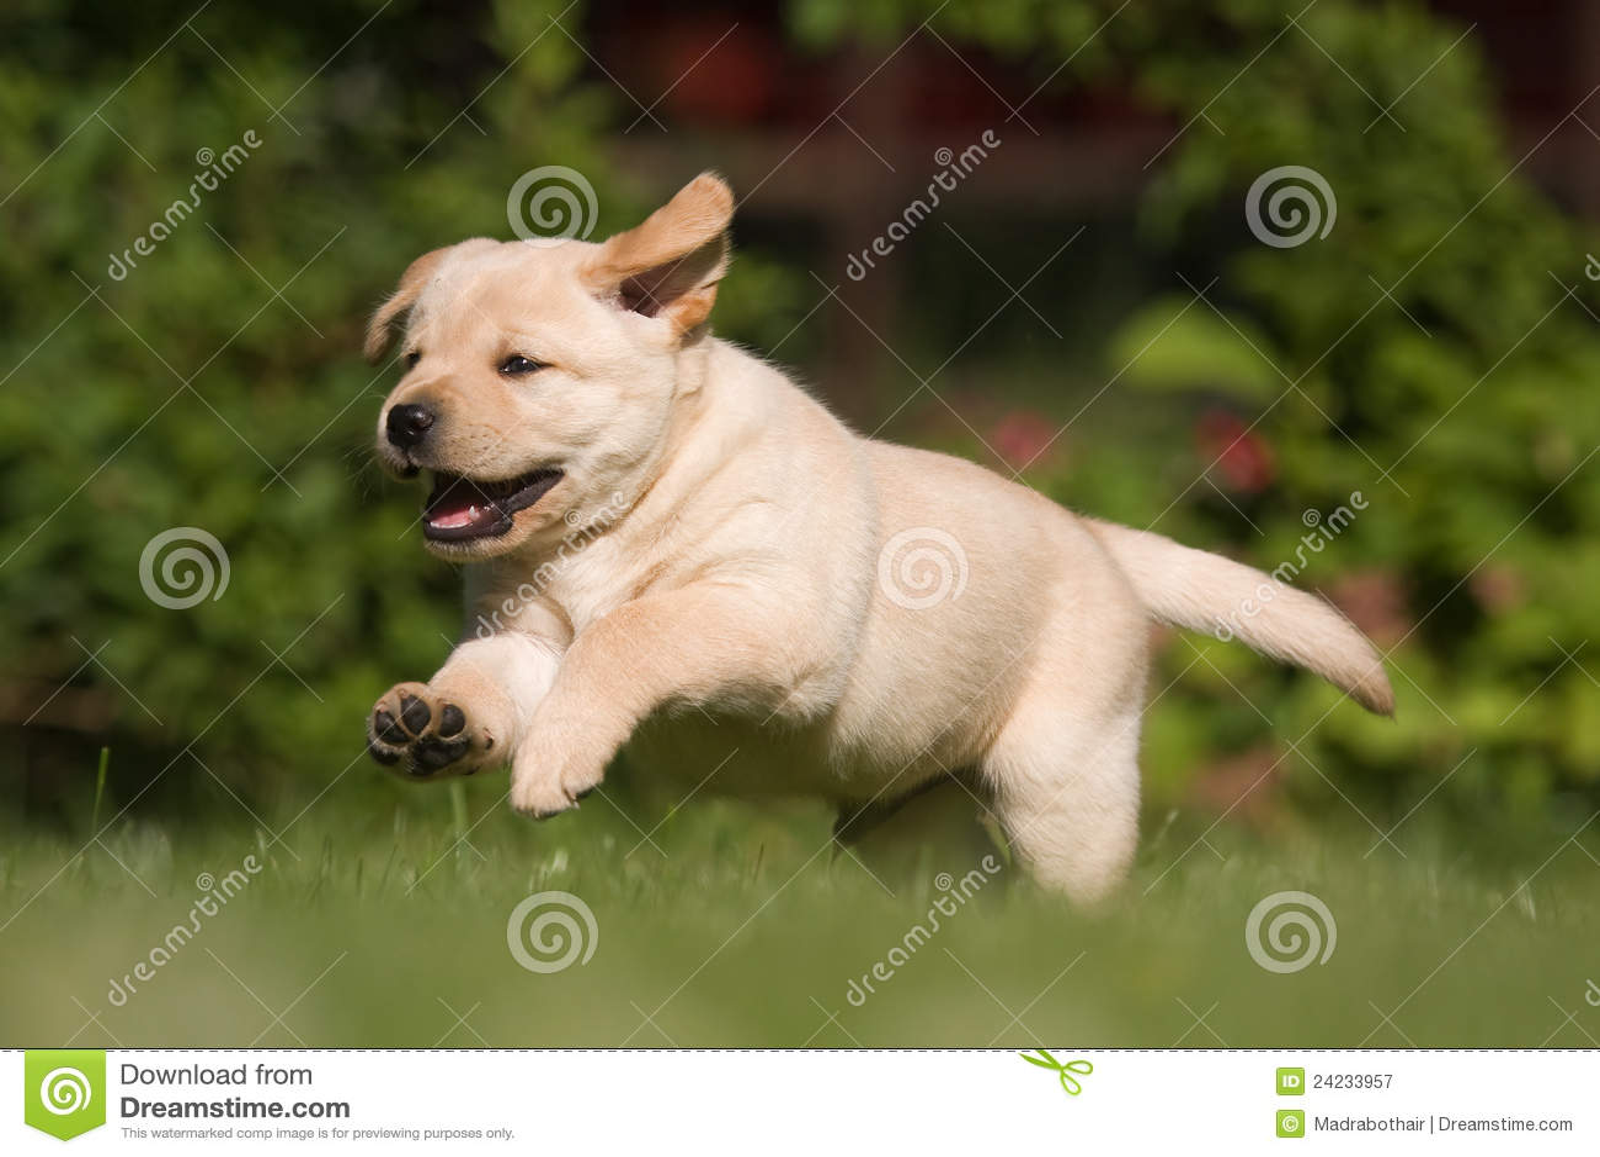 how to buy a labrador puppy